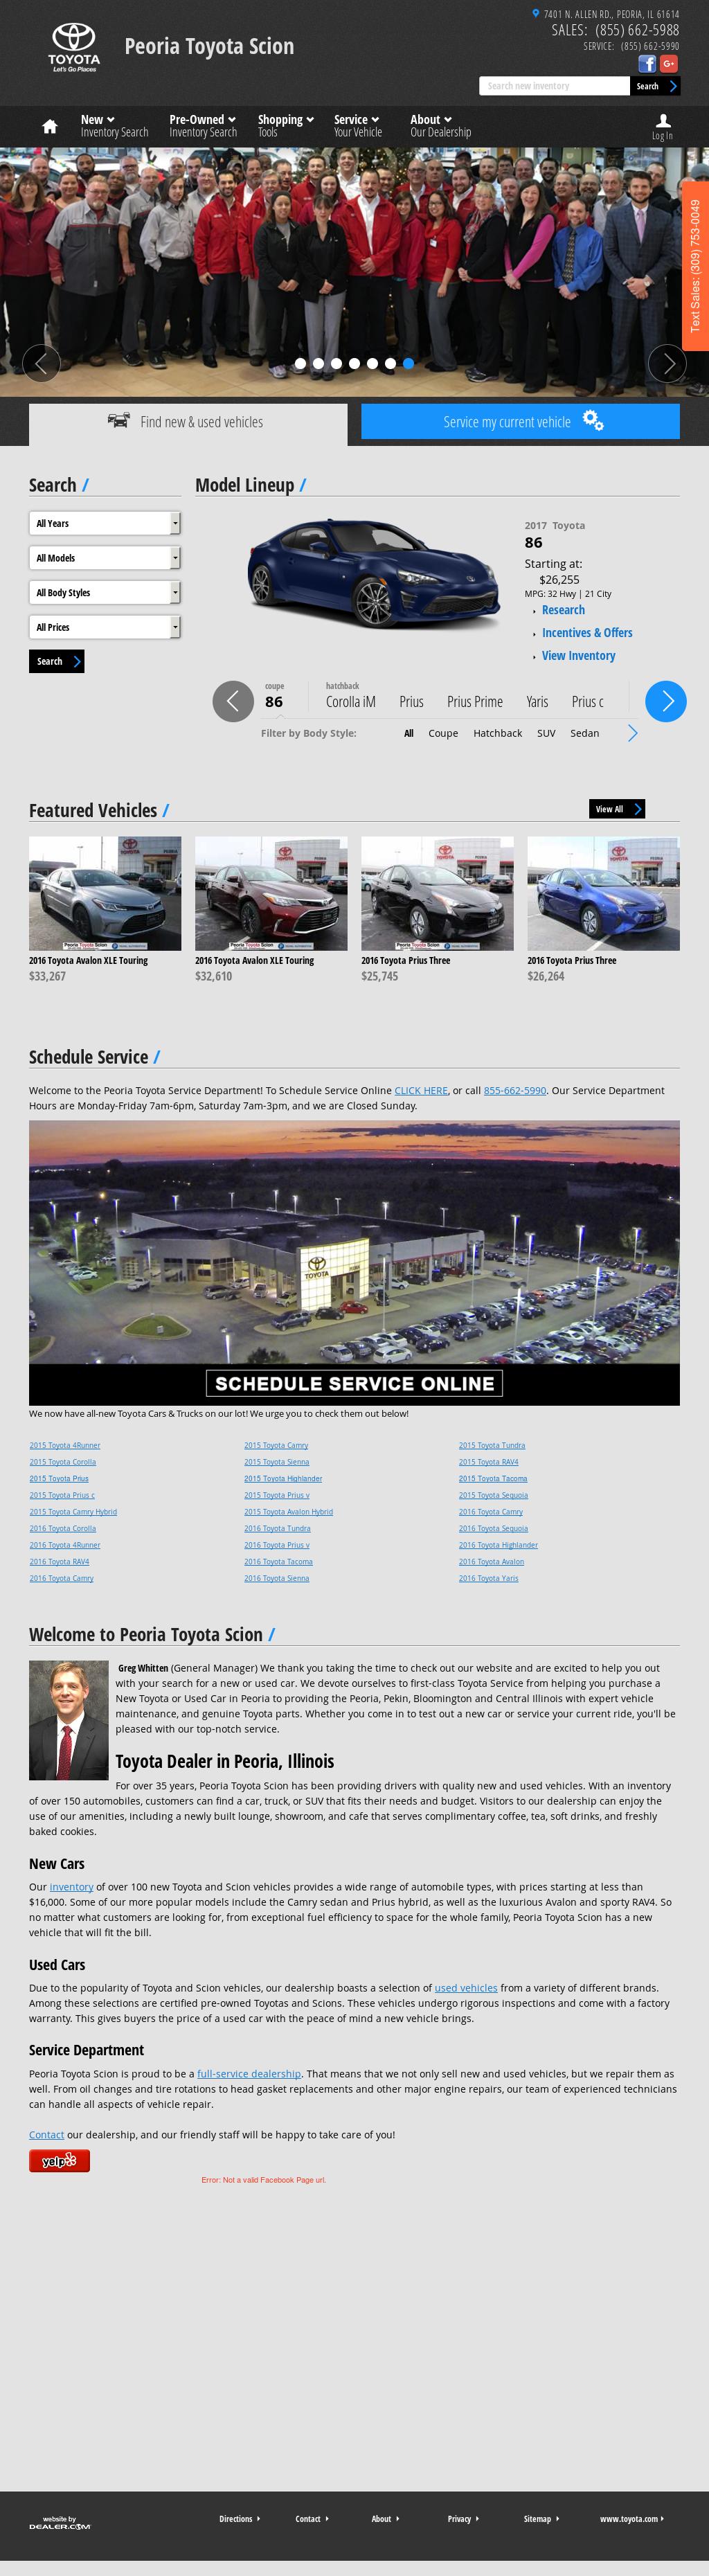 Peoria Toyota petitors Revenue and Employees Owler pany Profile